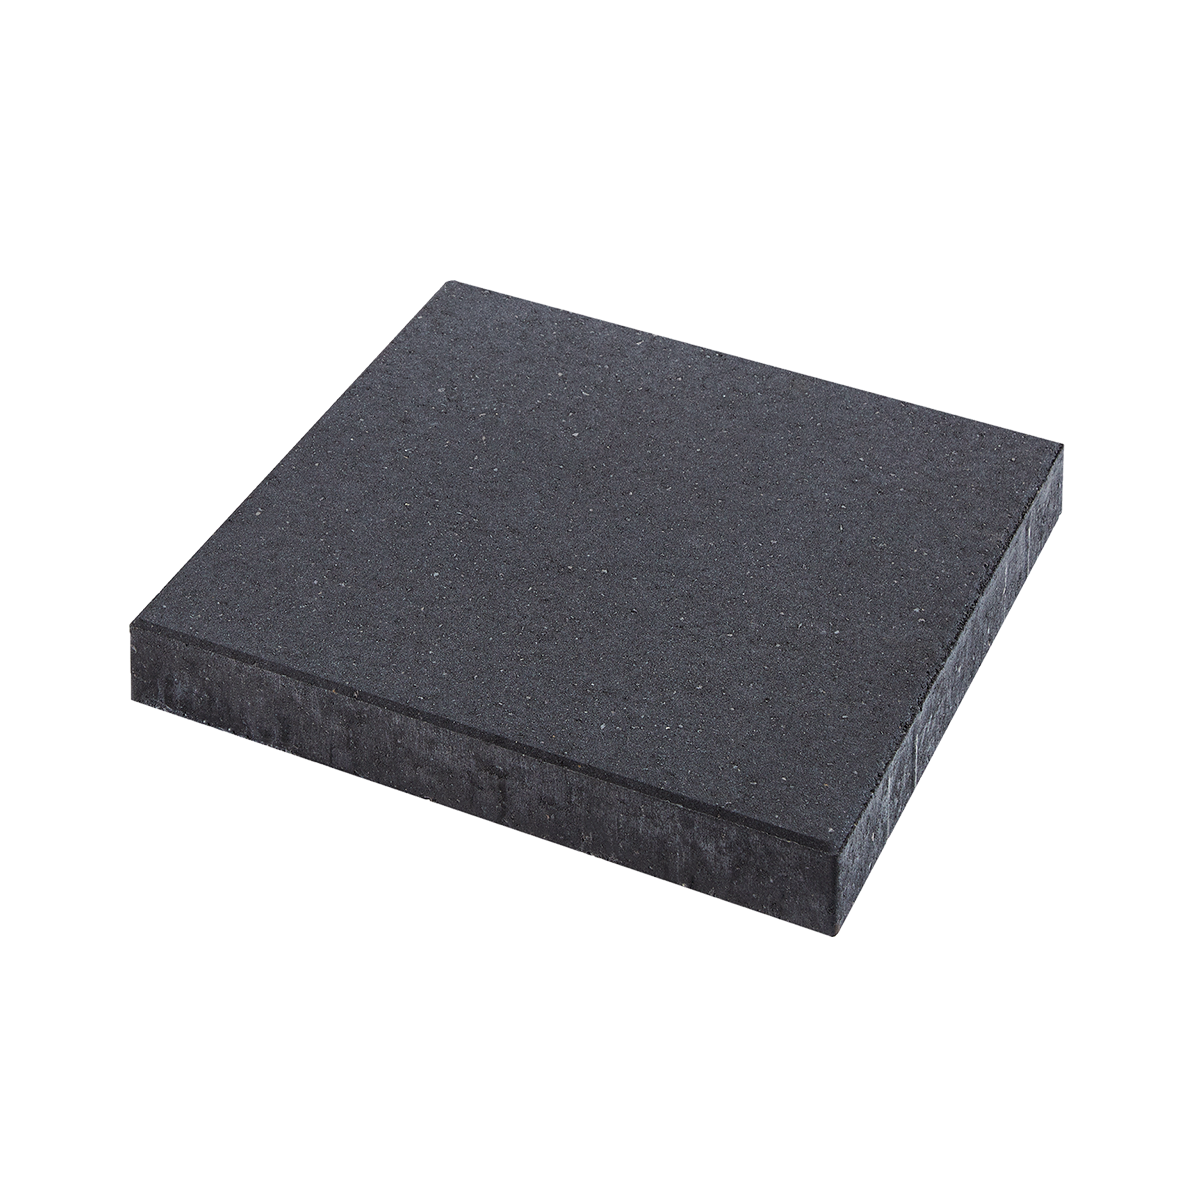 Fliser 50x50x8 cm Sort/Antracit